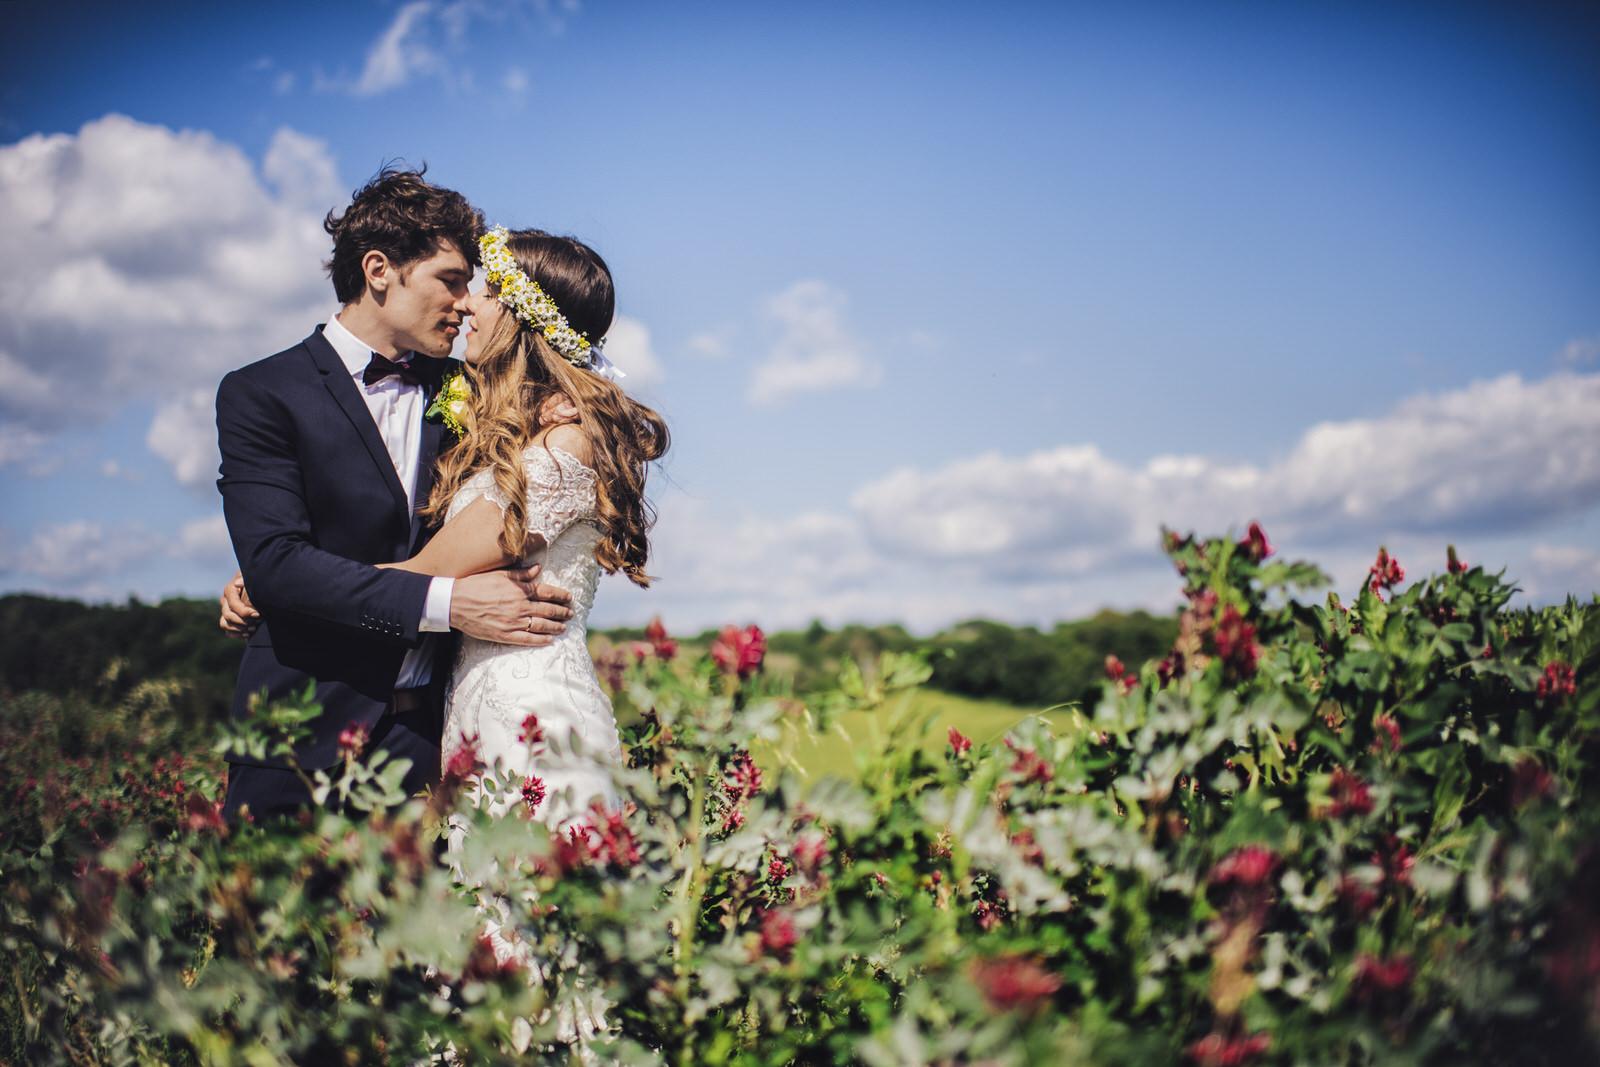 wedding photographer in italy-venice-tuscany-florence-amalfi coast-como lake-villa del balbianello-siena-amalfi-ravello-belmond-villa cimbrone10